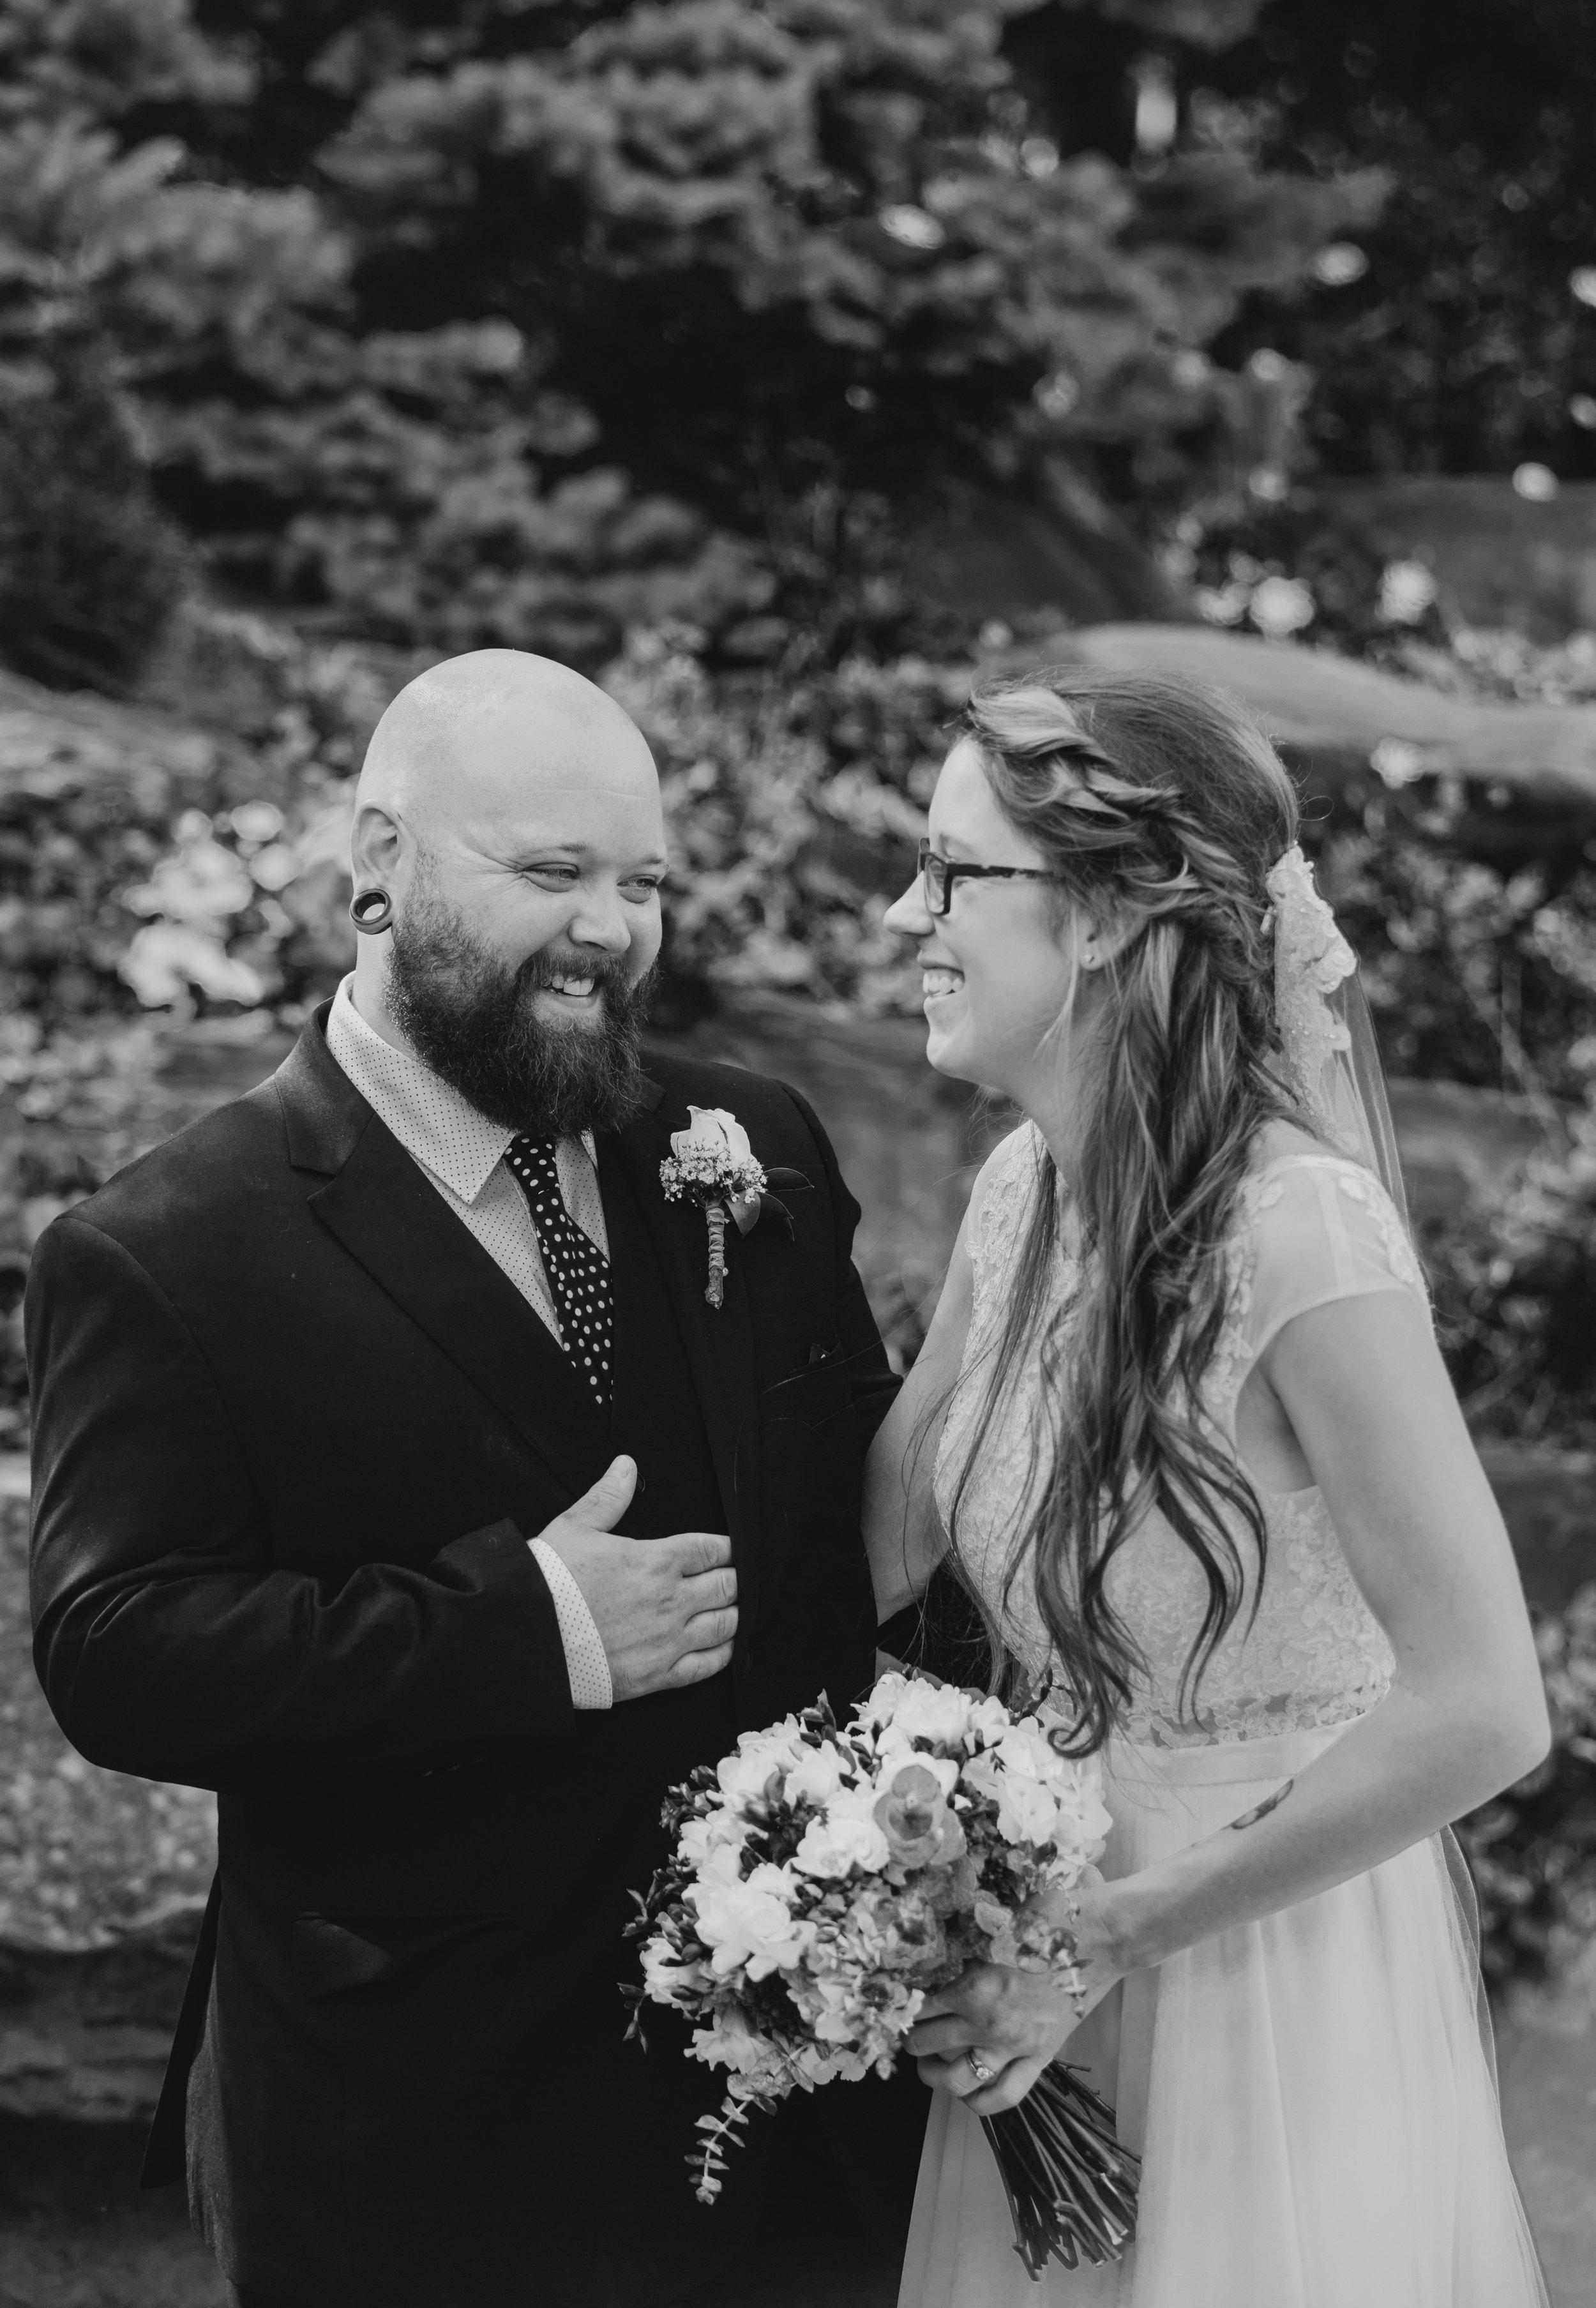 casey-brodley-wedding-photographer-grand-rapids-detroit-michigan-1.jpg